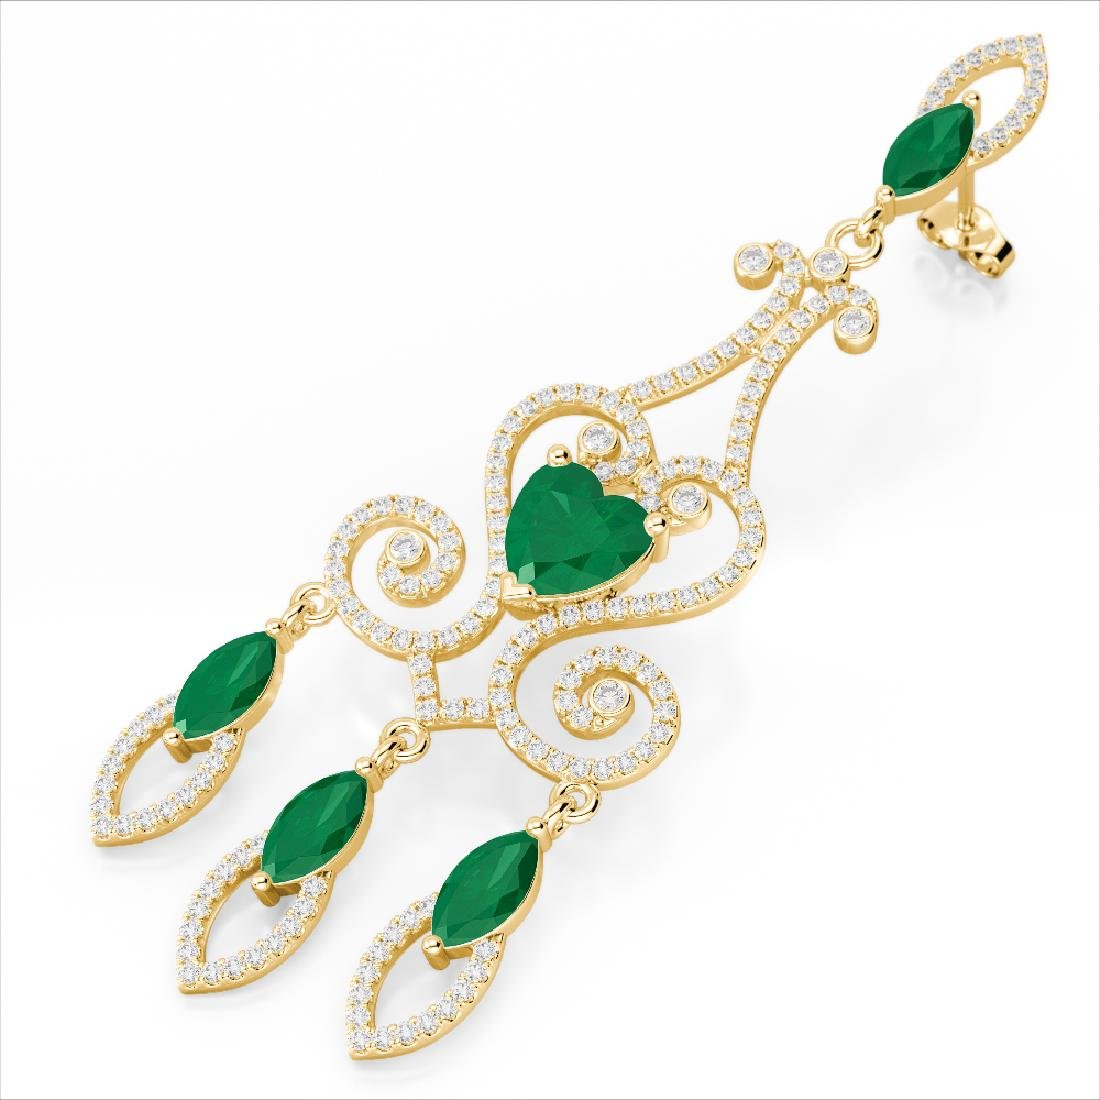 11 CTW Emerald & Micro Pave VS/SI Diamond Earrings 14K